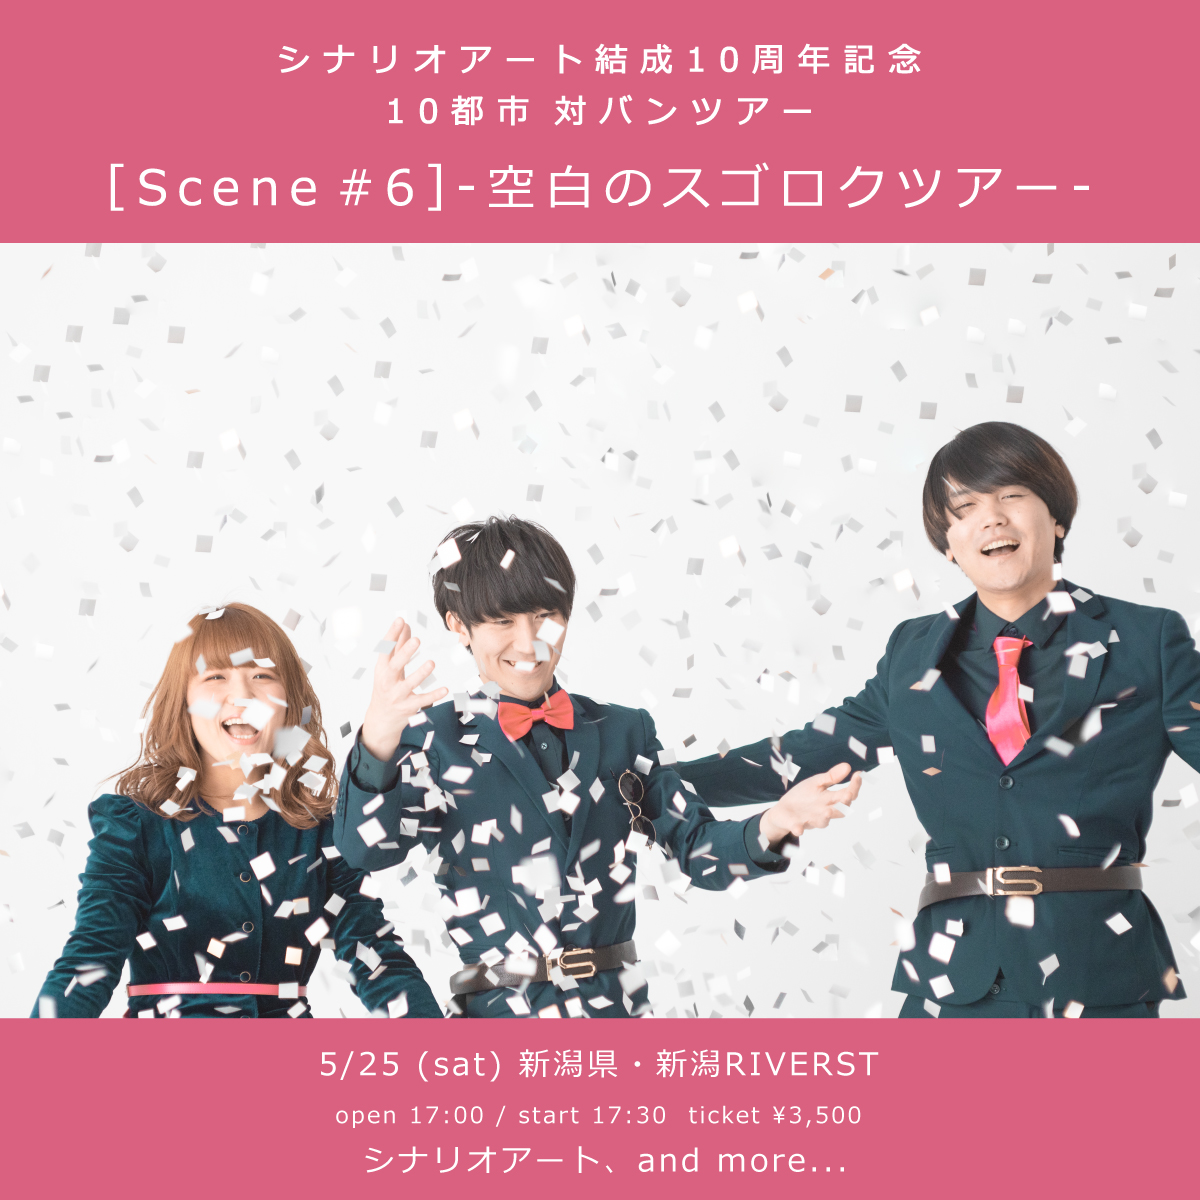 [Scene #6]-空白のスゴロクツアー- 《新潟公演》